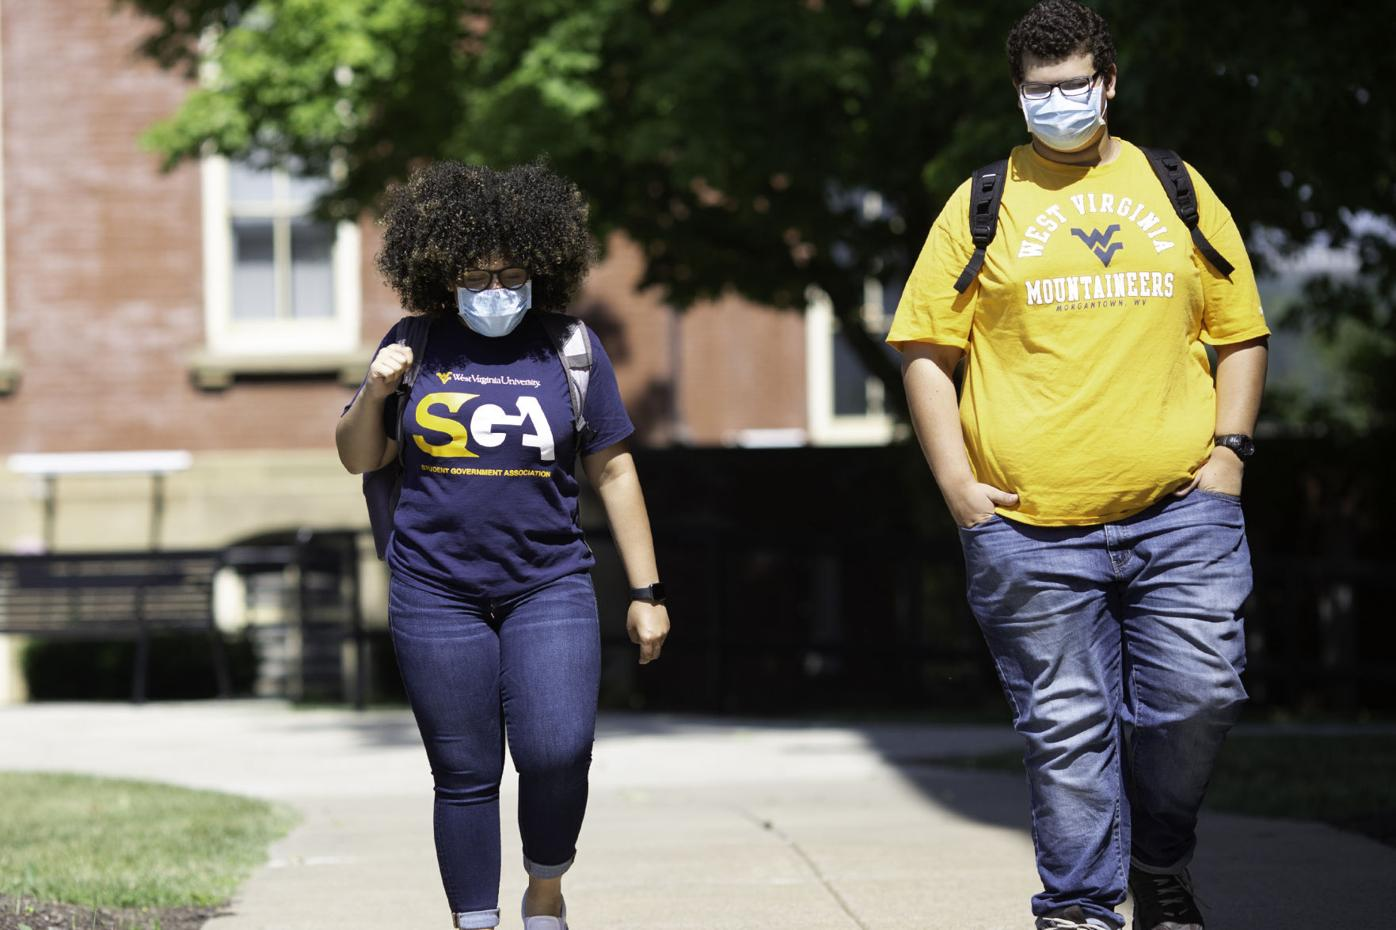 WVU Students Masks